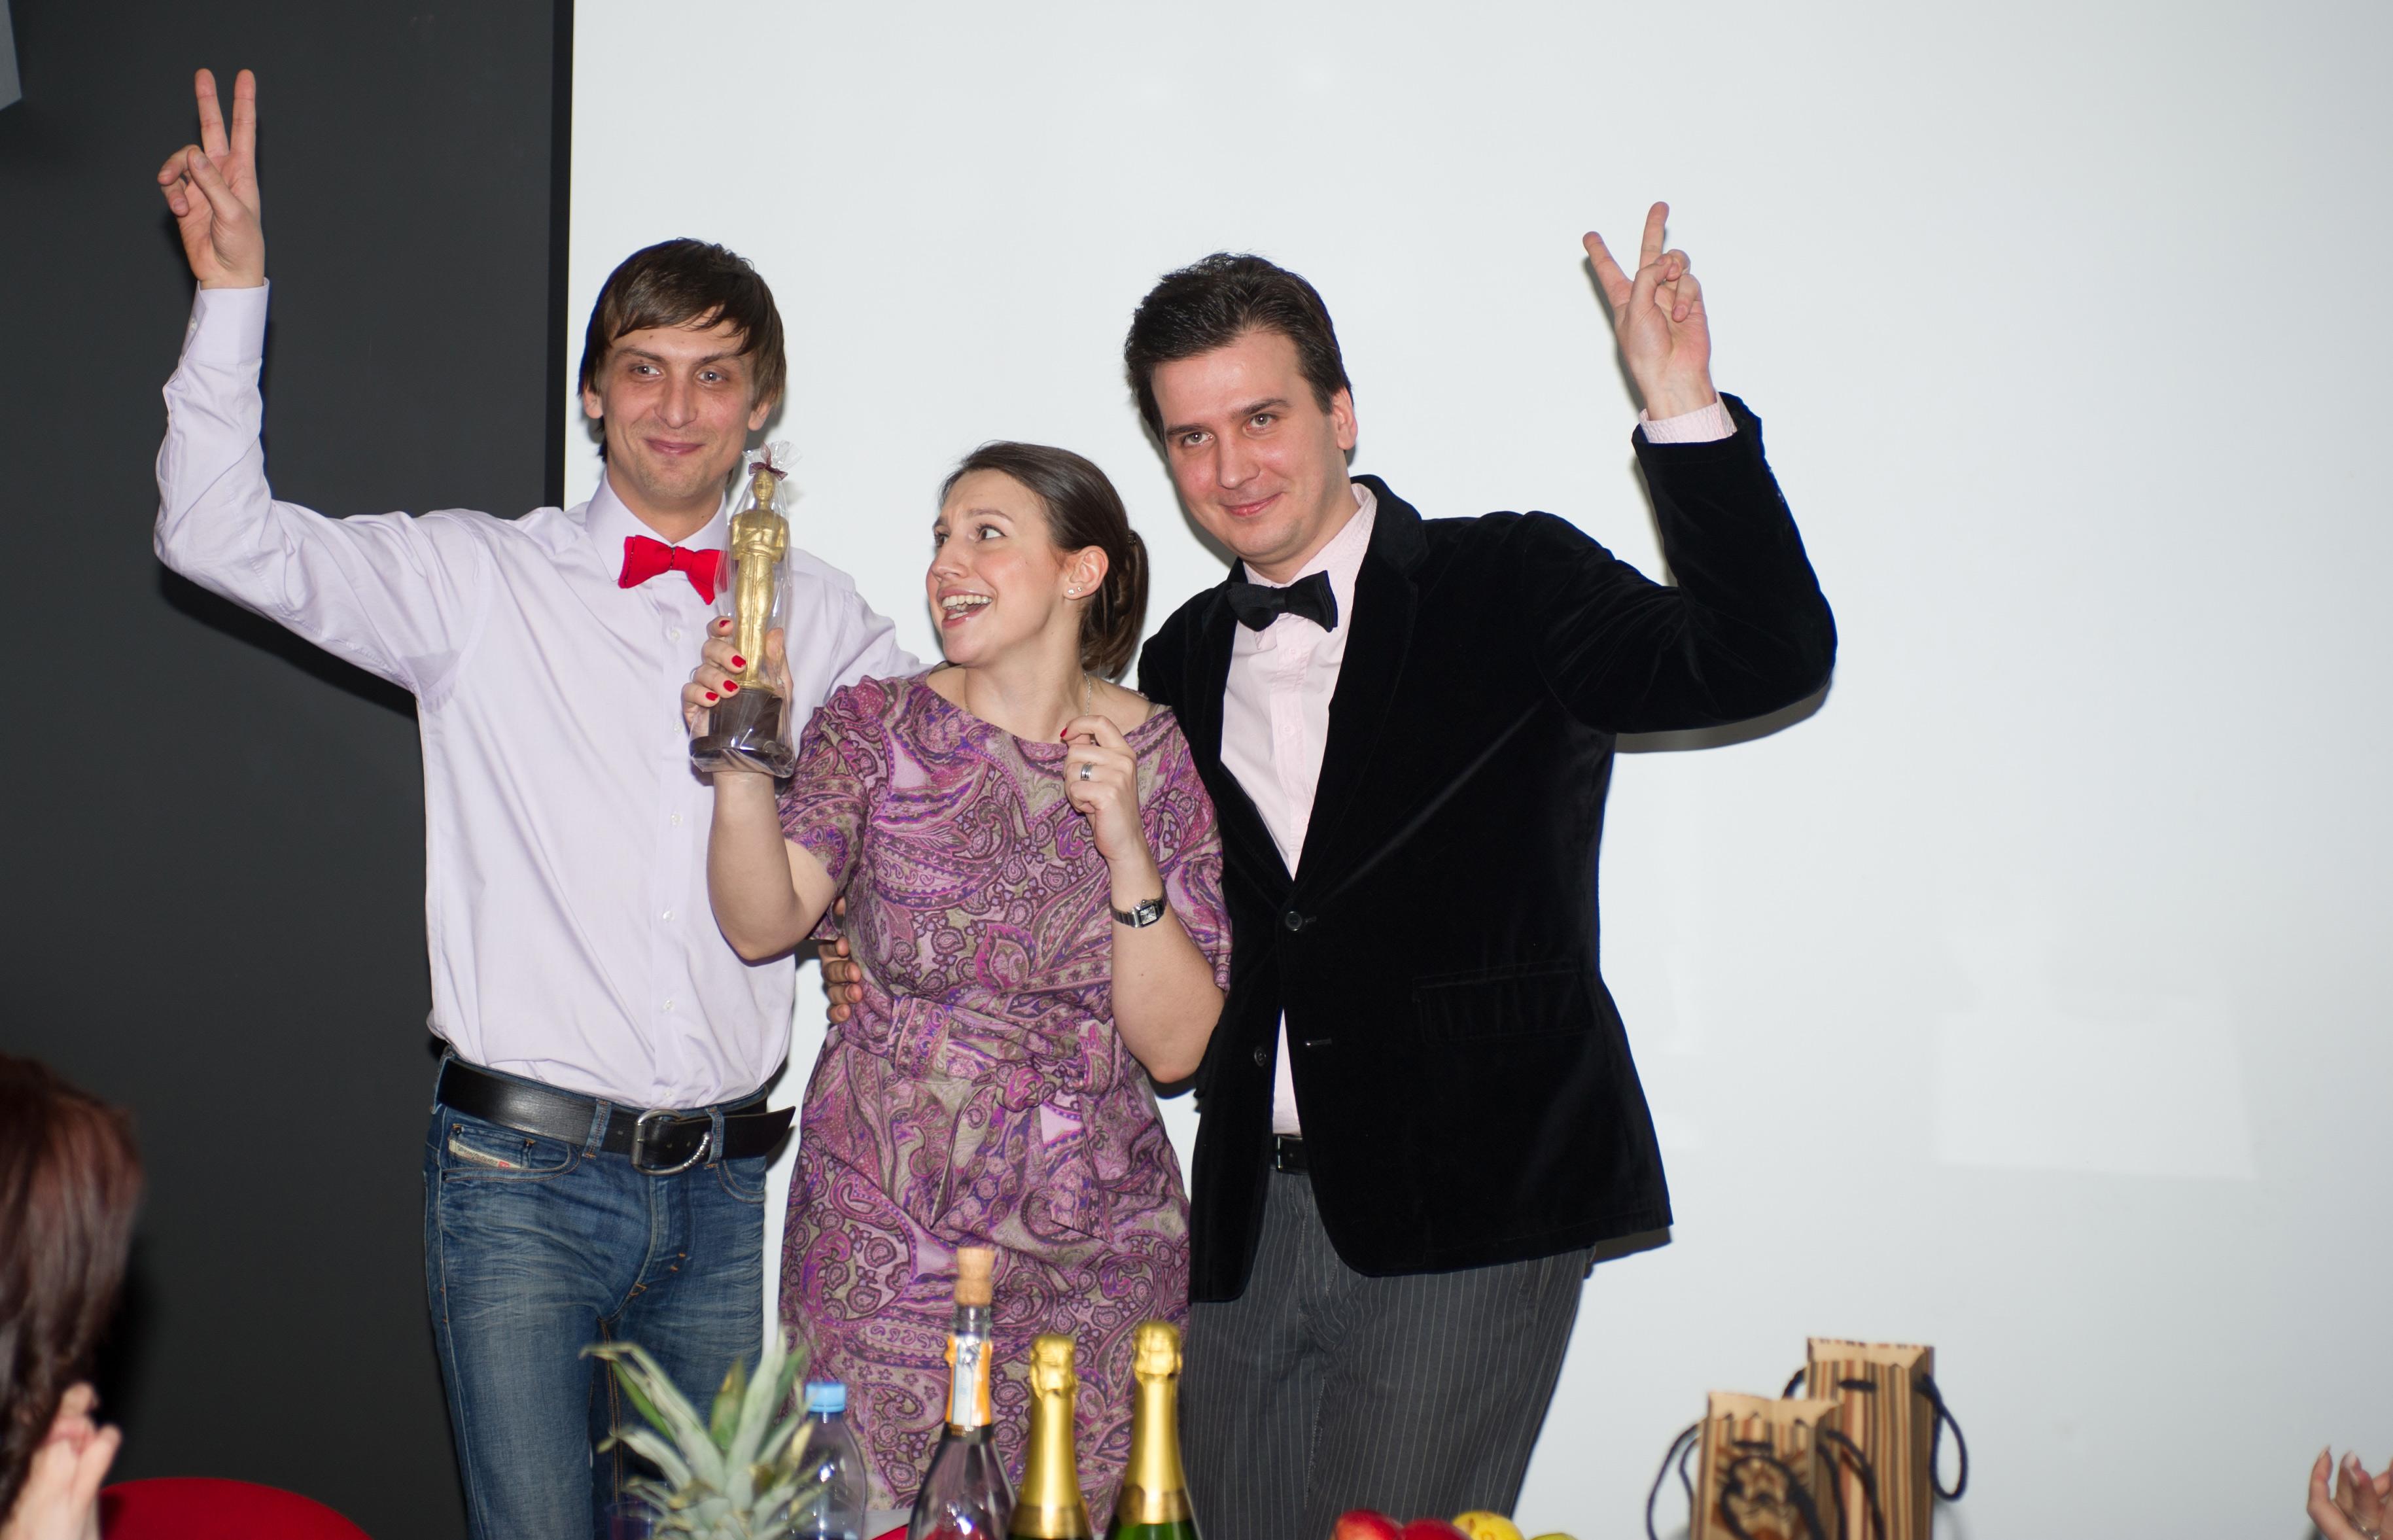 Коммуникационная группа MOV!E (МУВИ): Три грани одного бизнеса